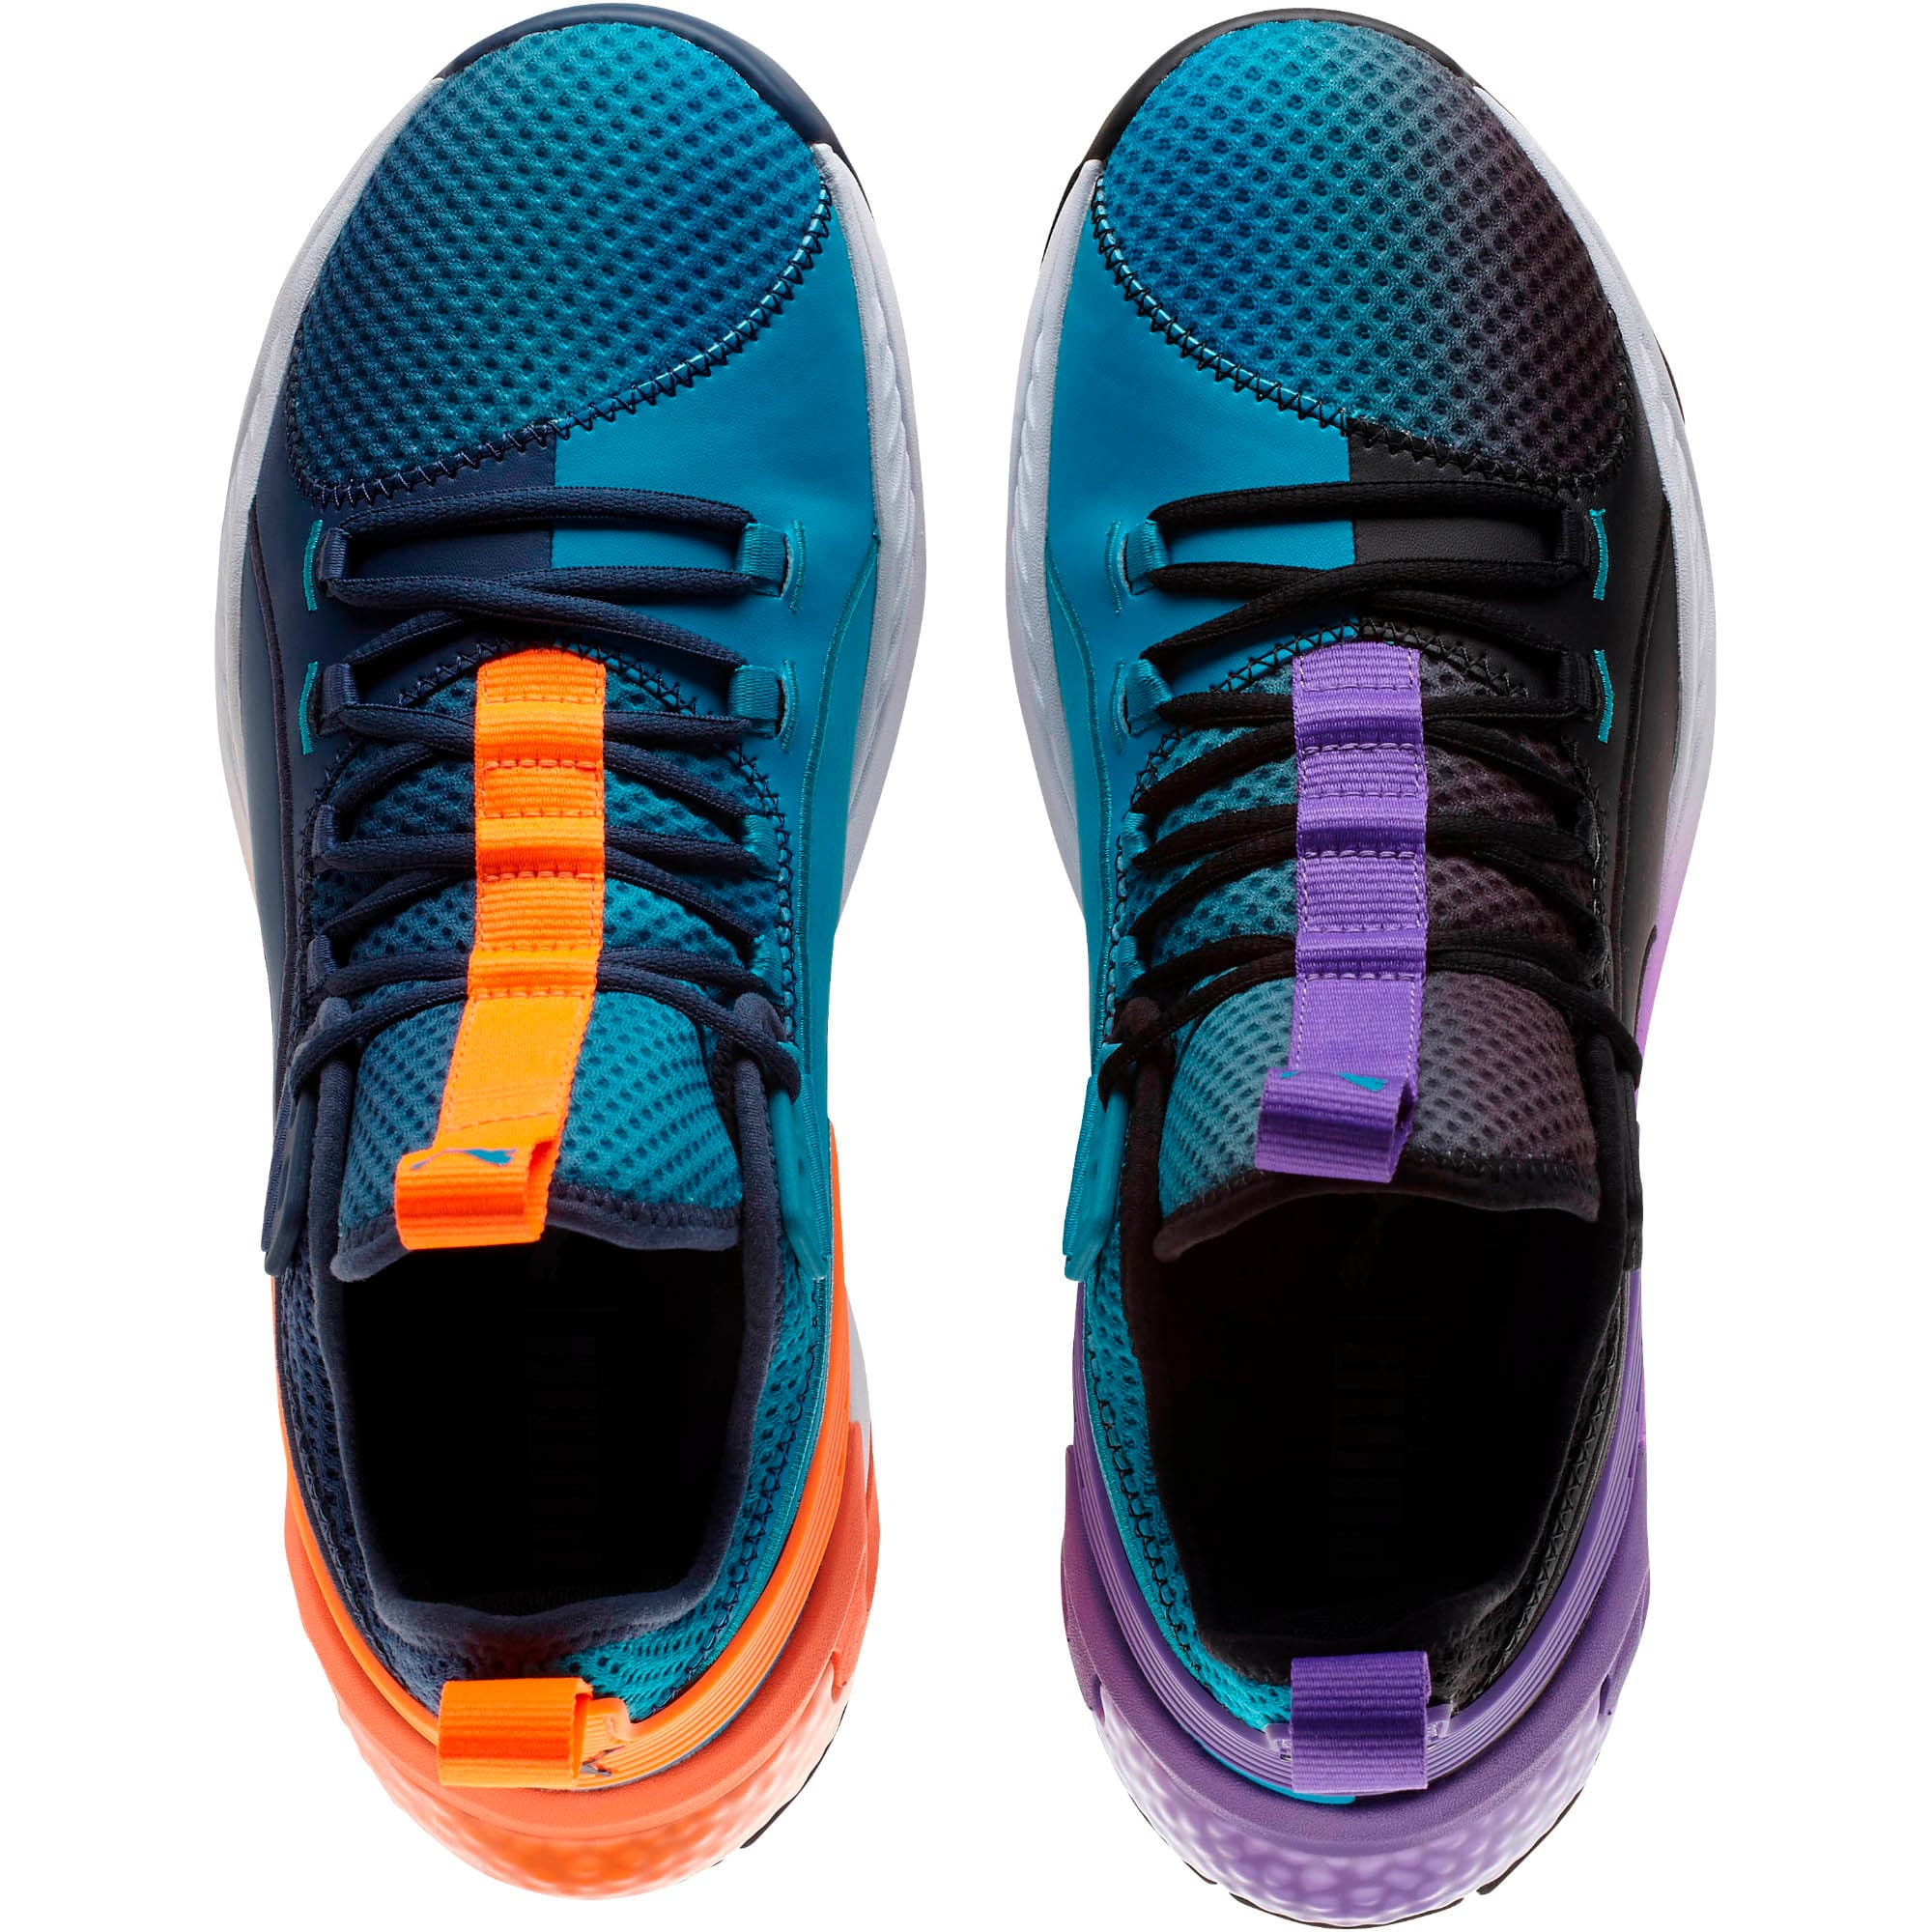 Thumbnail 8 of Uproar Charlotte ASG Fade Basketball Shoes, Orange- PURPLE, medium